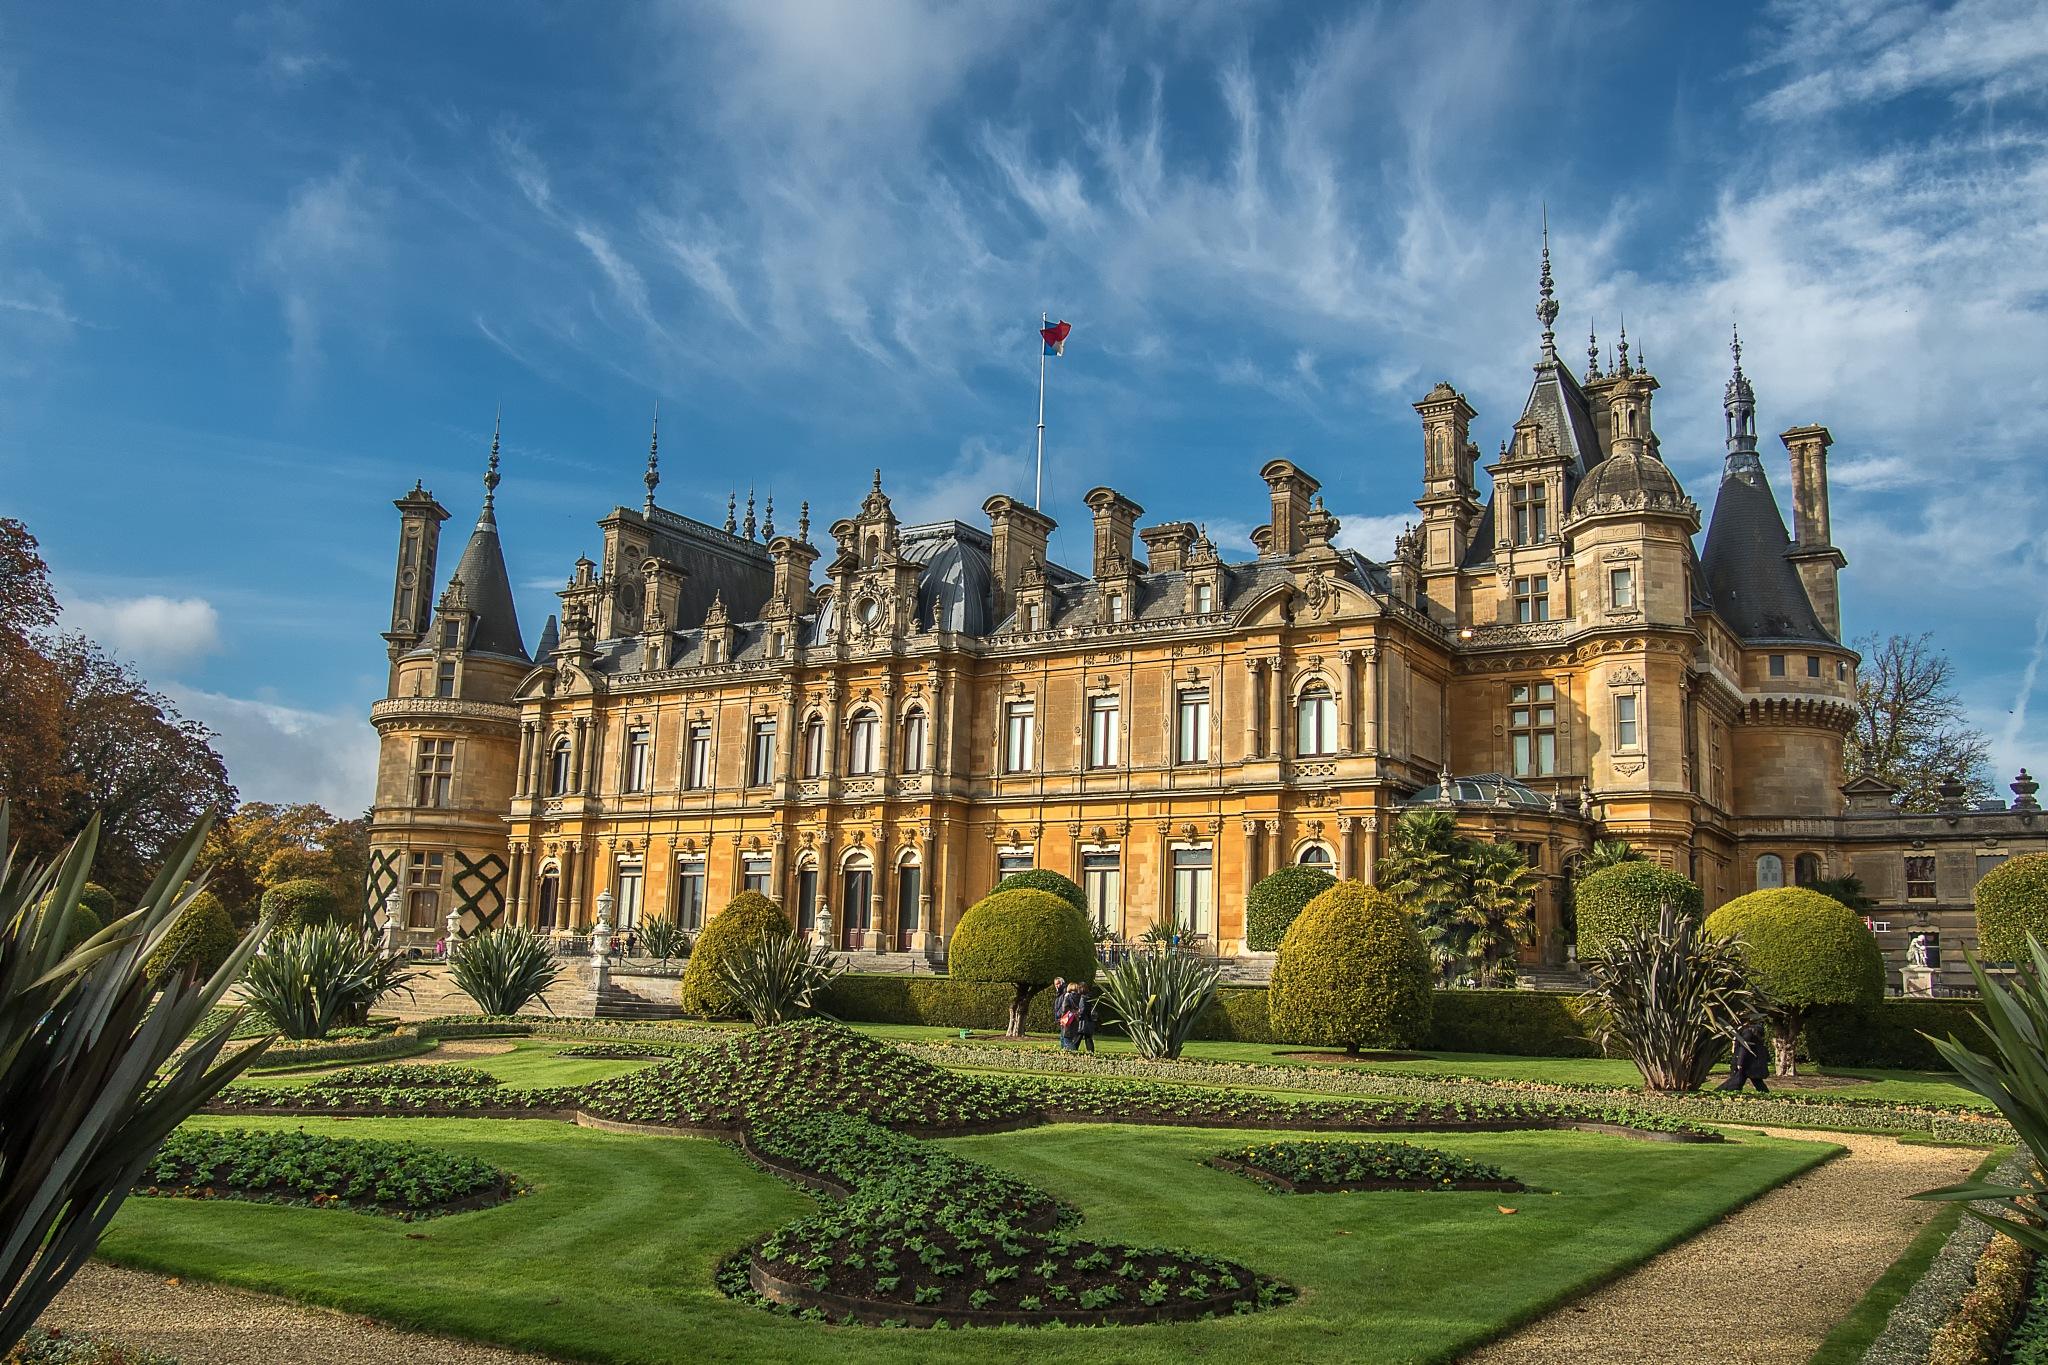 Waddeston Manor by Gary Tripp